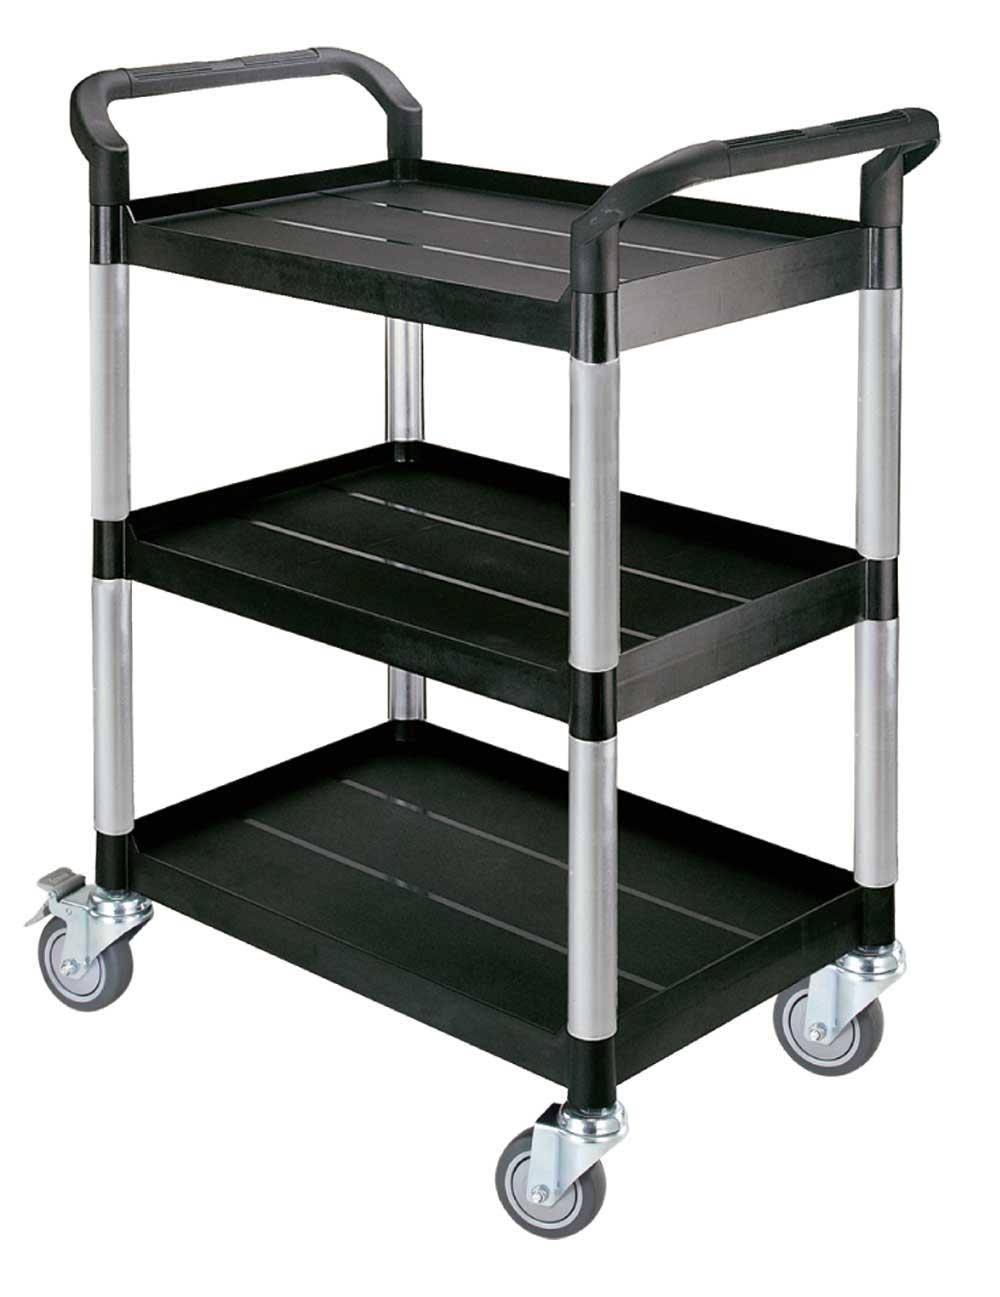 FTI Rullebord - grå/sort plast m. stålstel, m. 3 hylder, smal (48x85) Sort